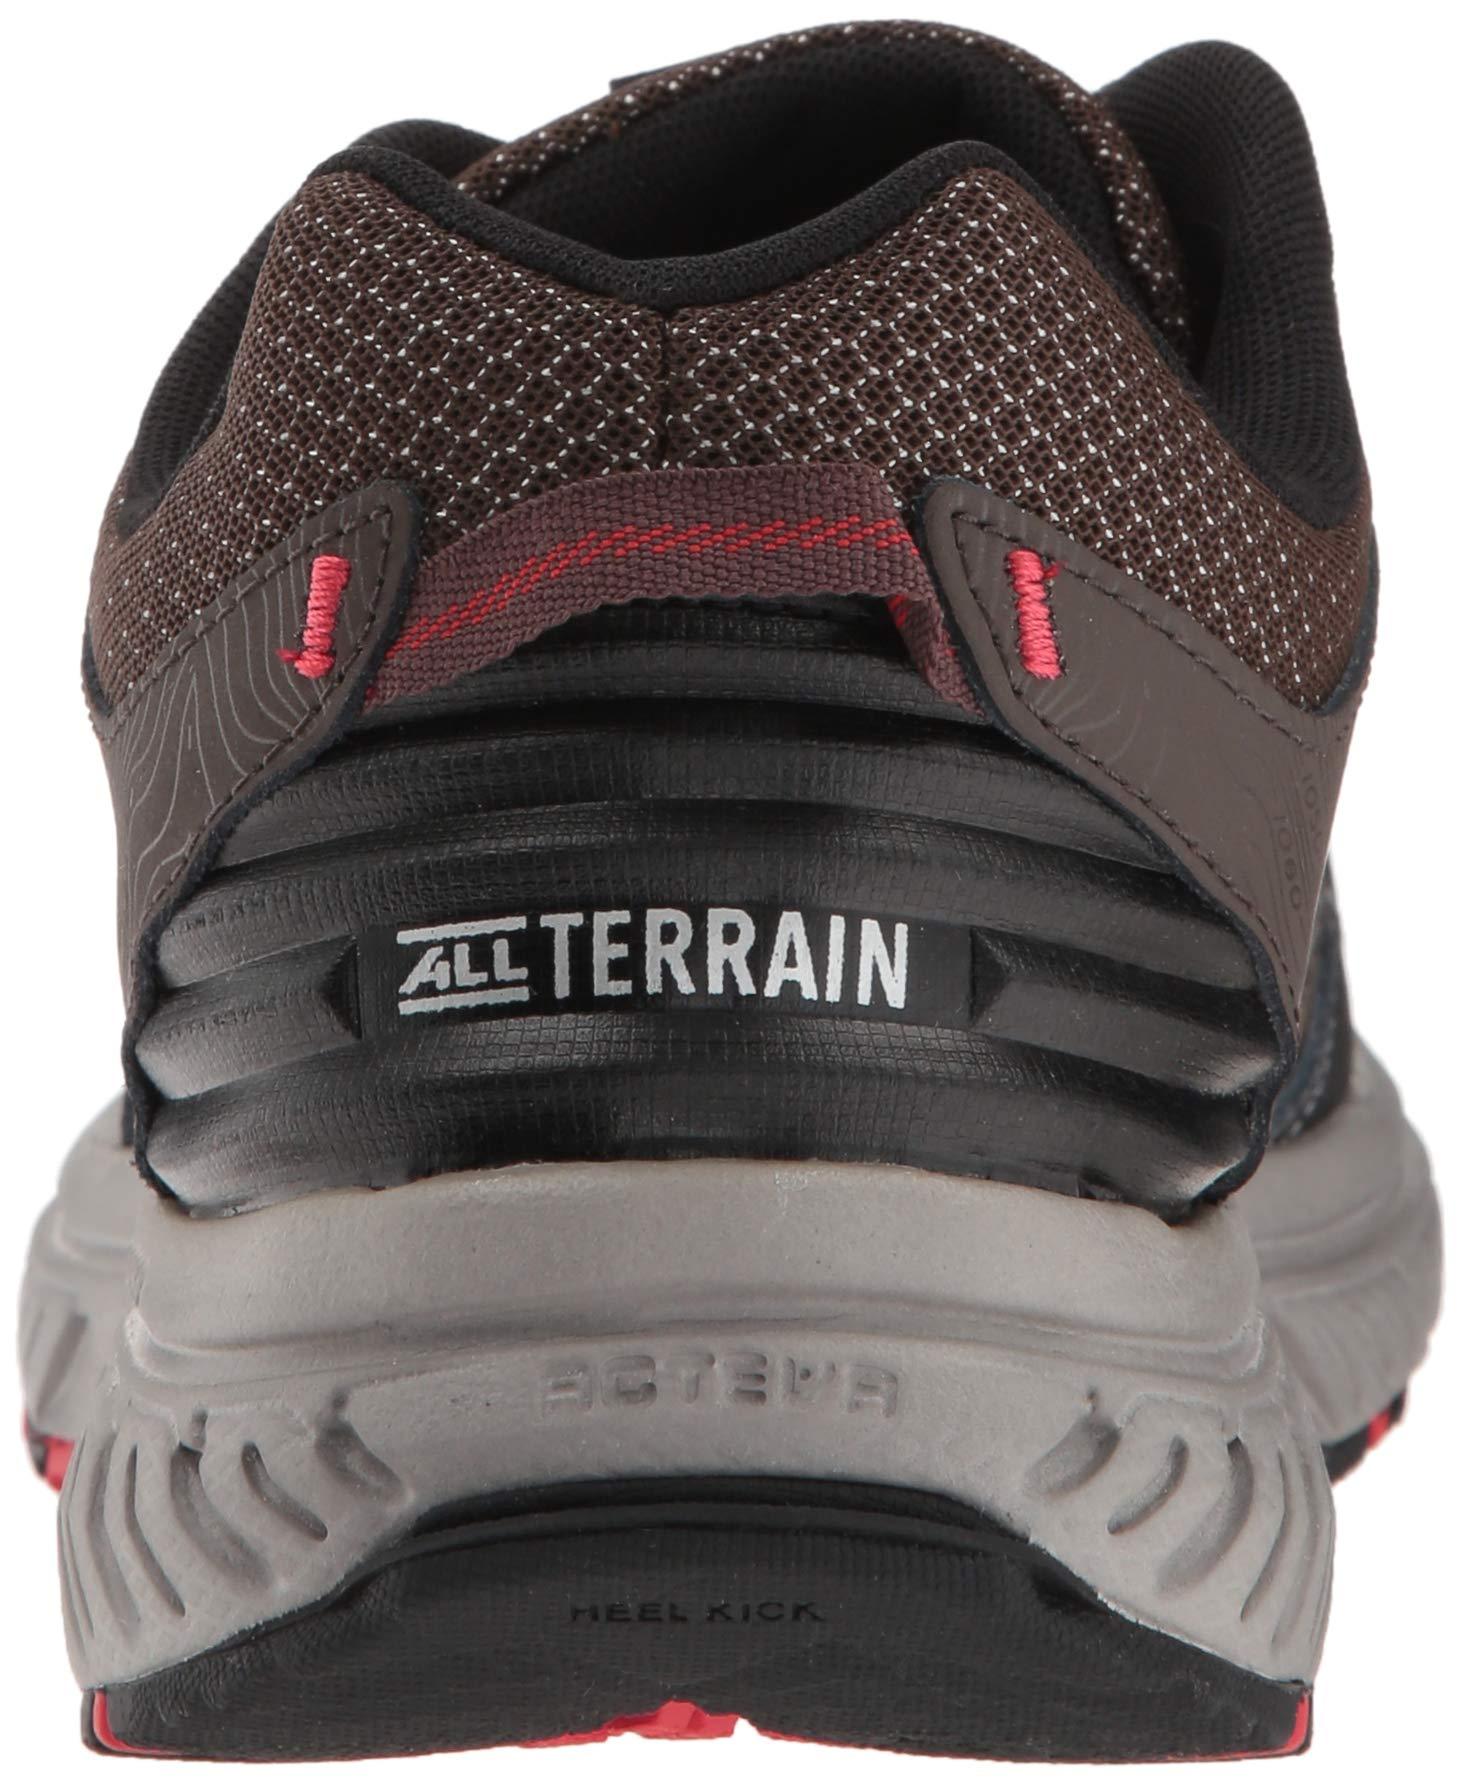 New Balance Men's 510v4 Cushioning Trail Running Shoe, Chocolate/Black/Team red, 7 D US by New Balance (Image #2)